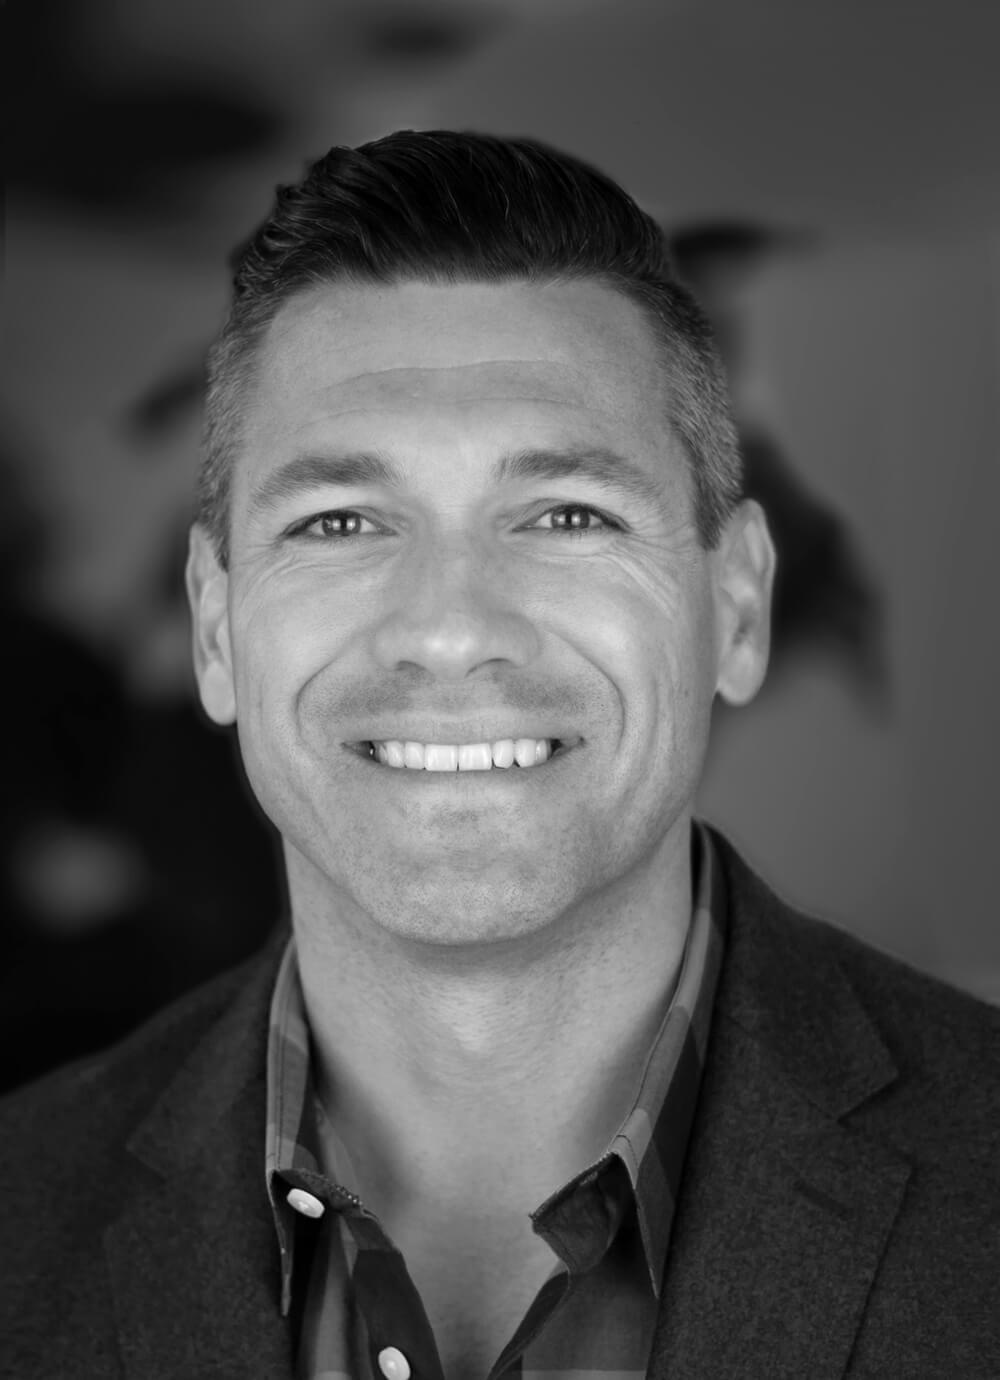 Chris McCuiston